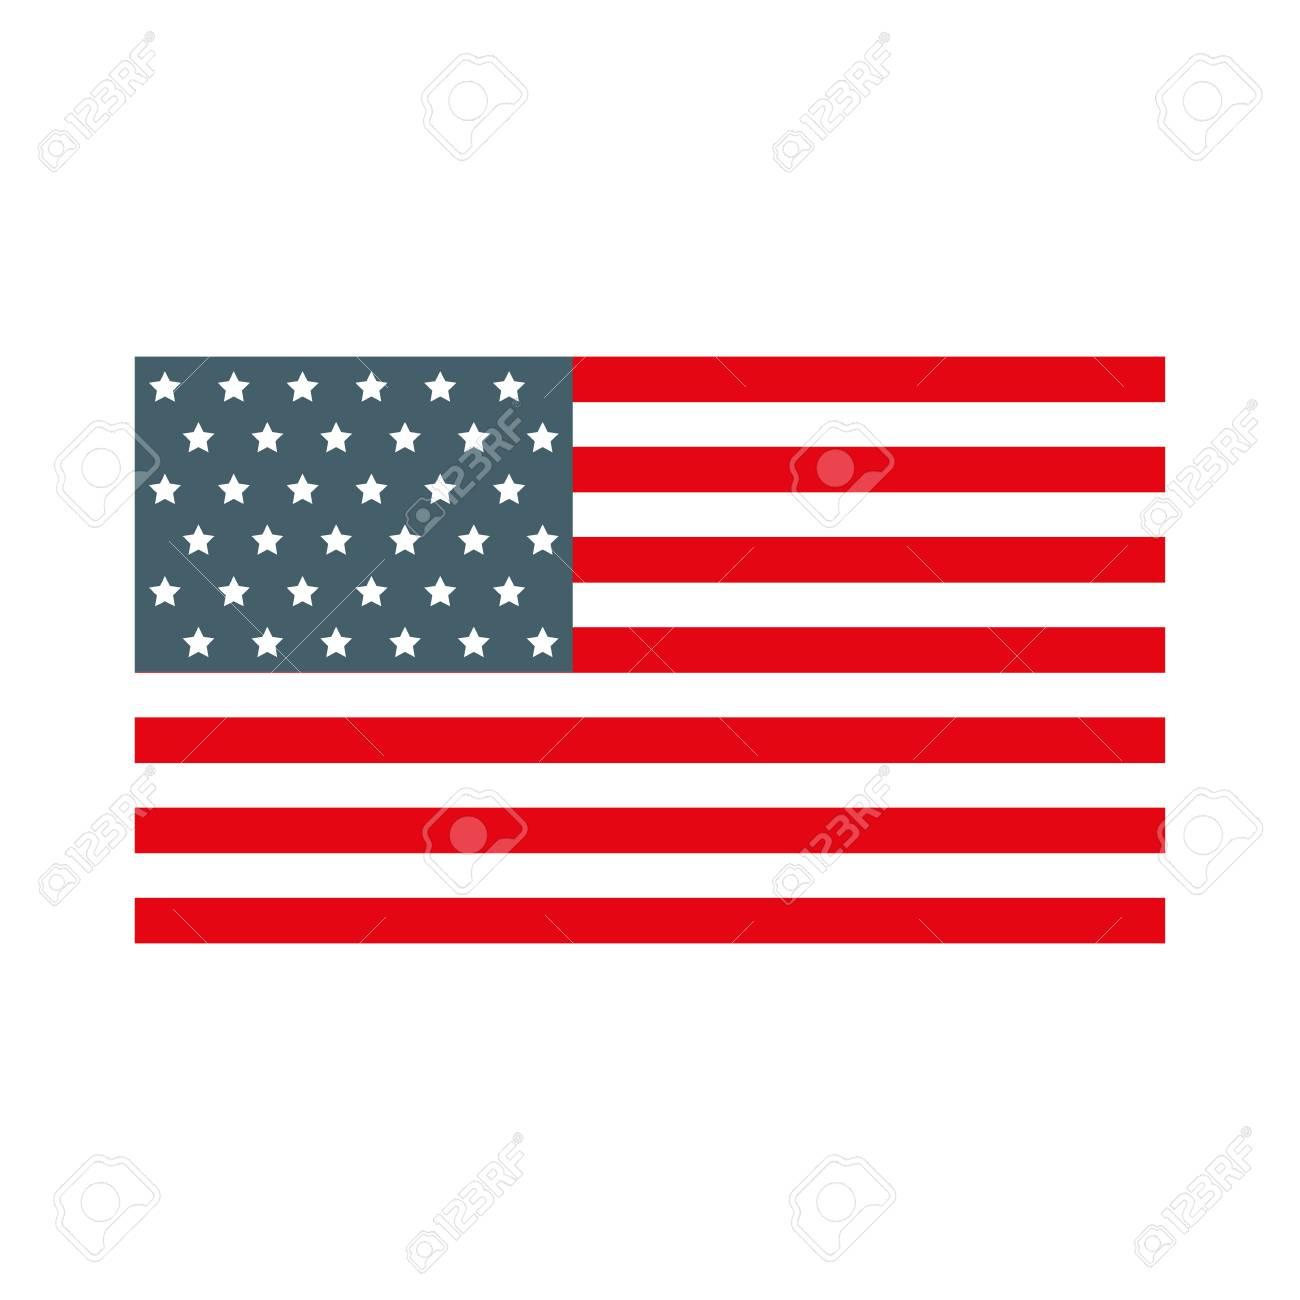 cute american flag icon cartoon vector graphic design royalty free rh 123rf com american flag graphic design american flag graphic for wk2